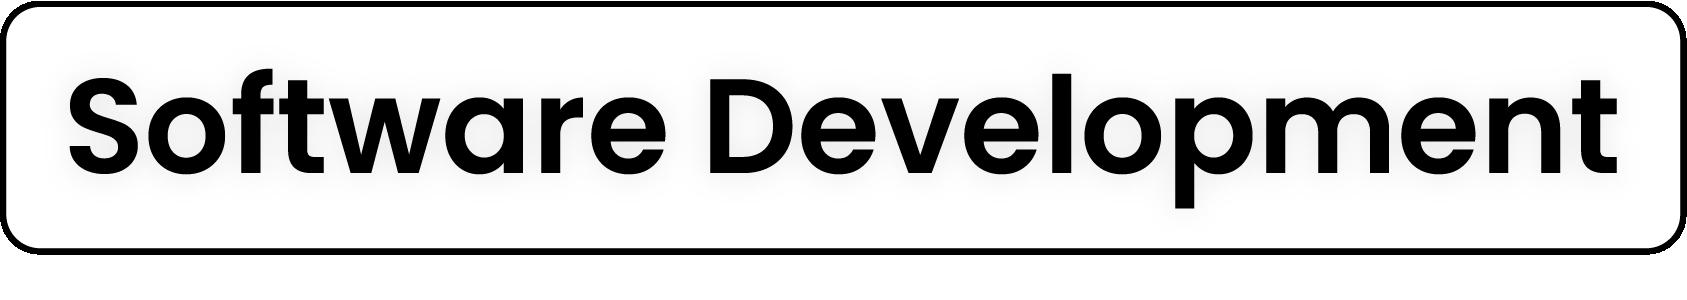 Development process label: Software Development